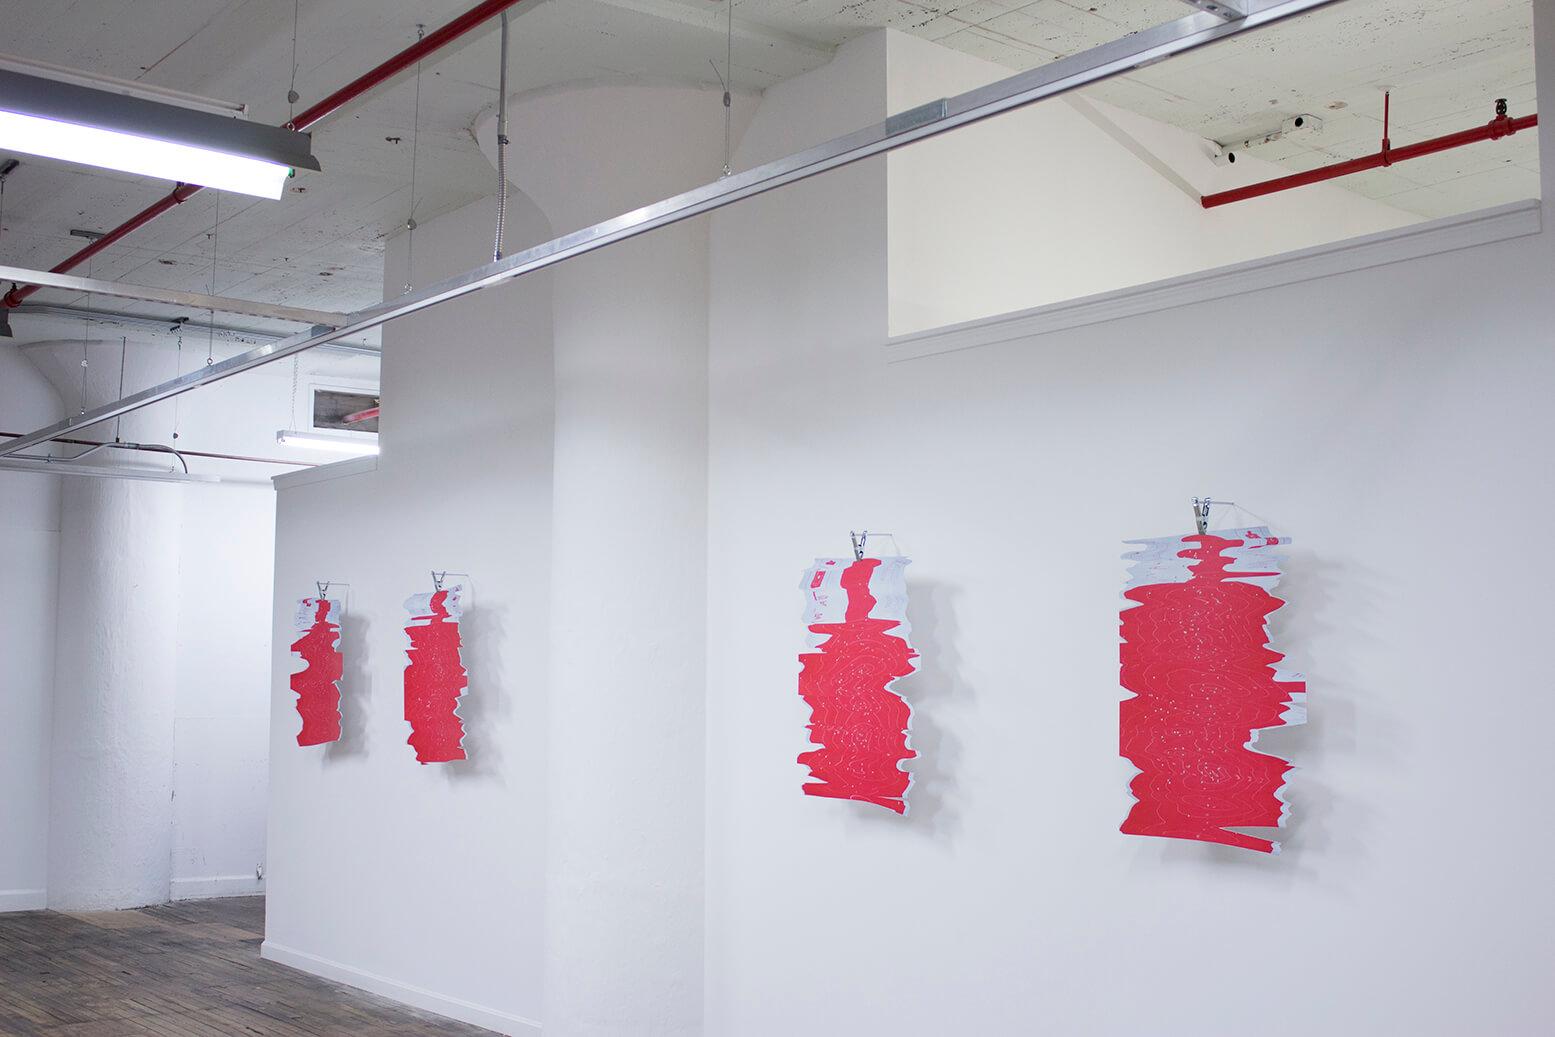 Adolfo Bimer,  SCANS , Vistas de instalación. Cleveland Print Room, Cleveland, United States, 2015